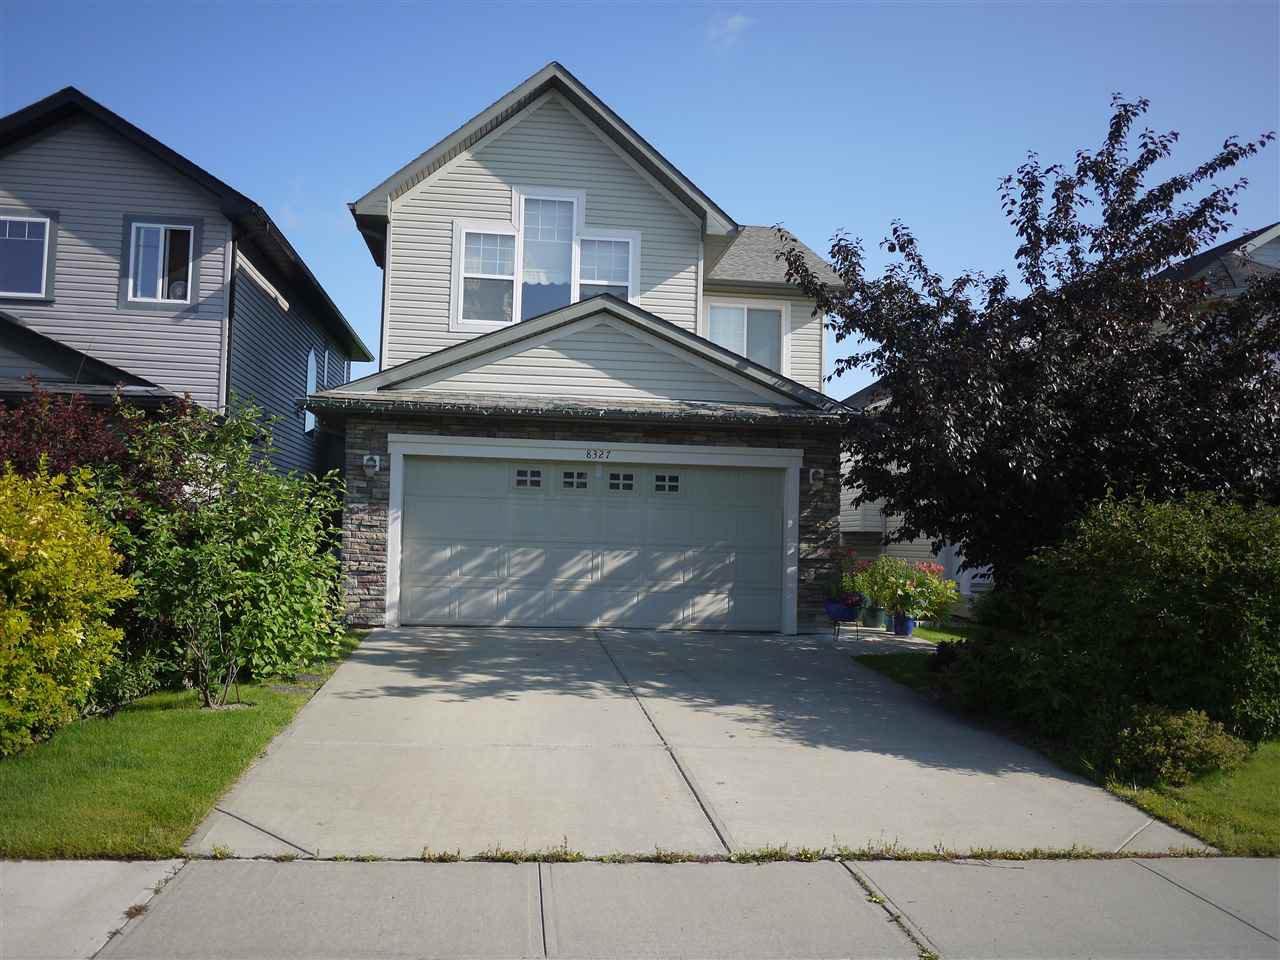 Main Photo: 8327 Shaske Crescent in Edmonton: Zone 14 House for sale : MLS®# E4168868